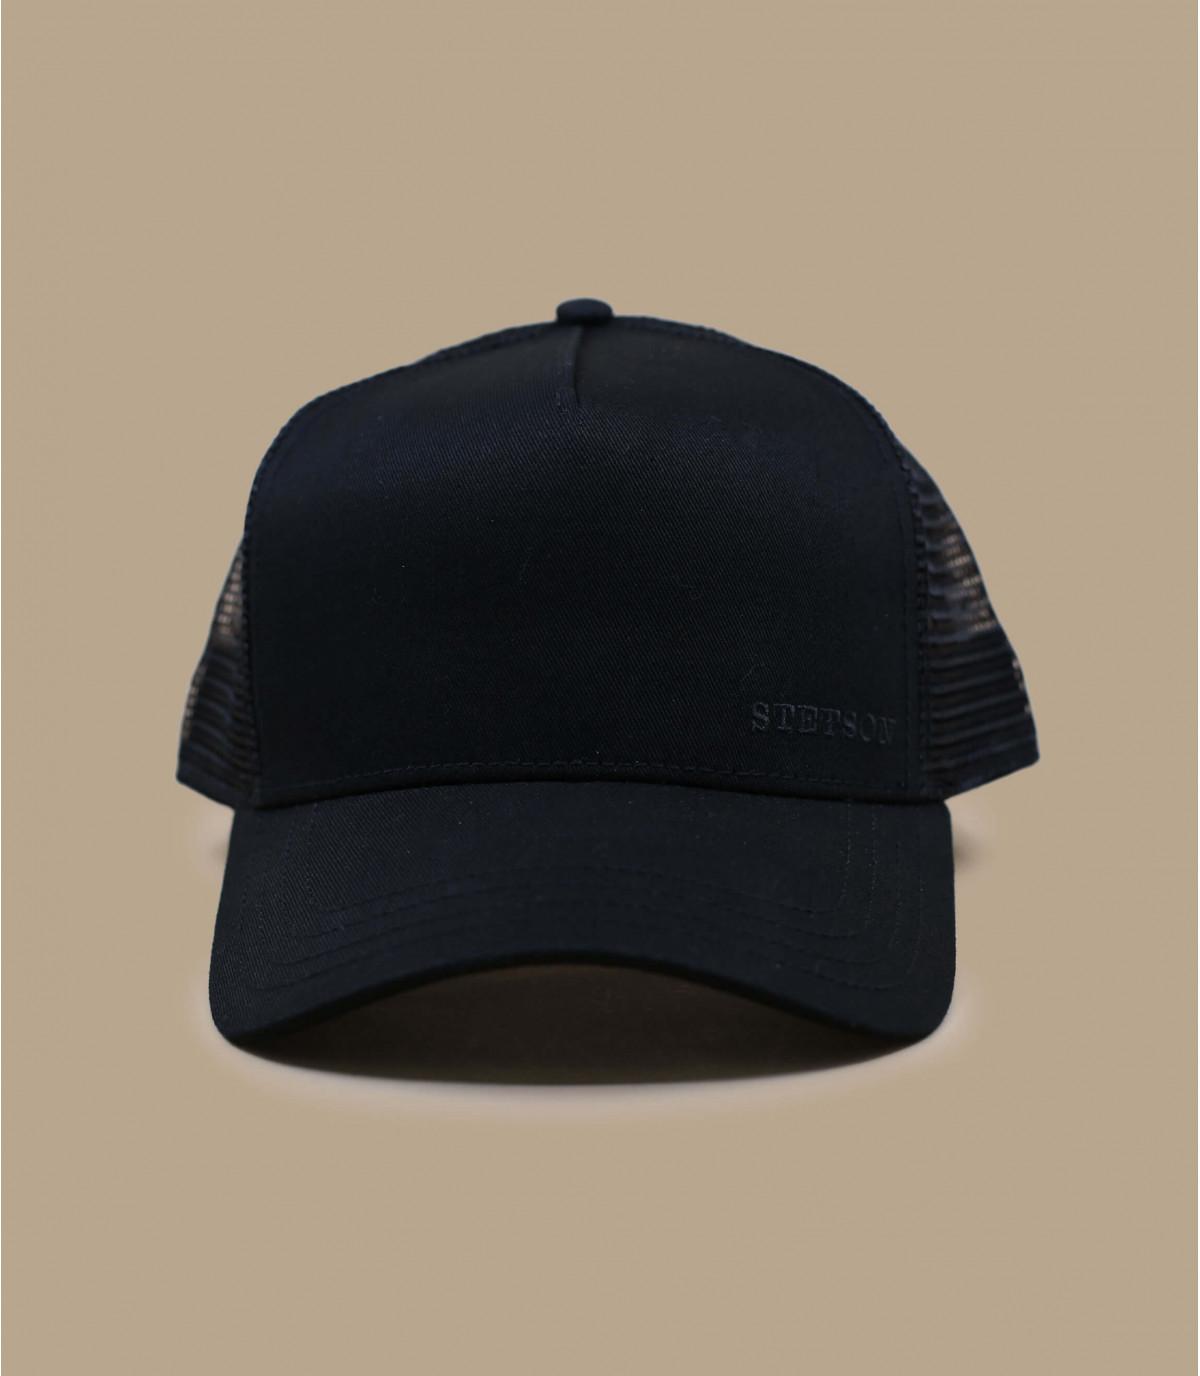 black trucker cap